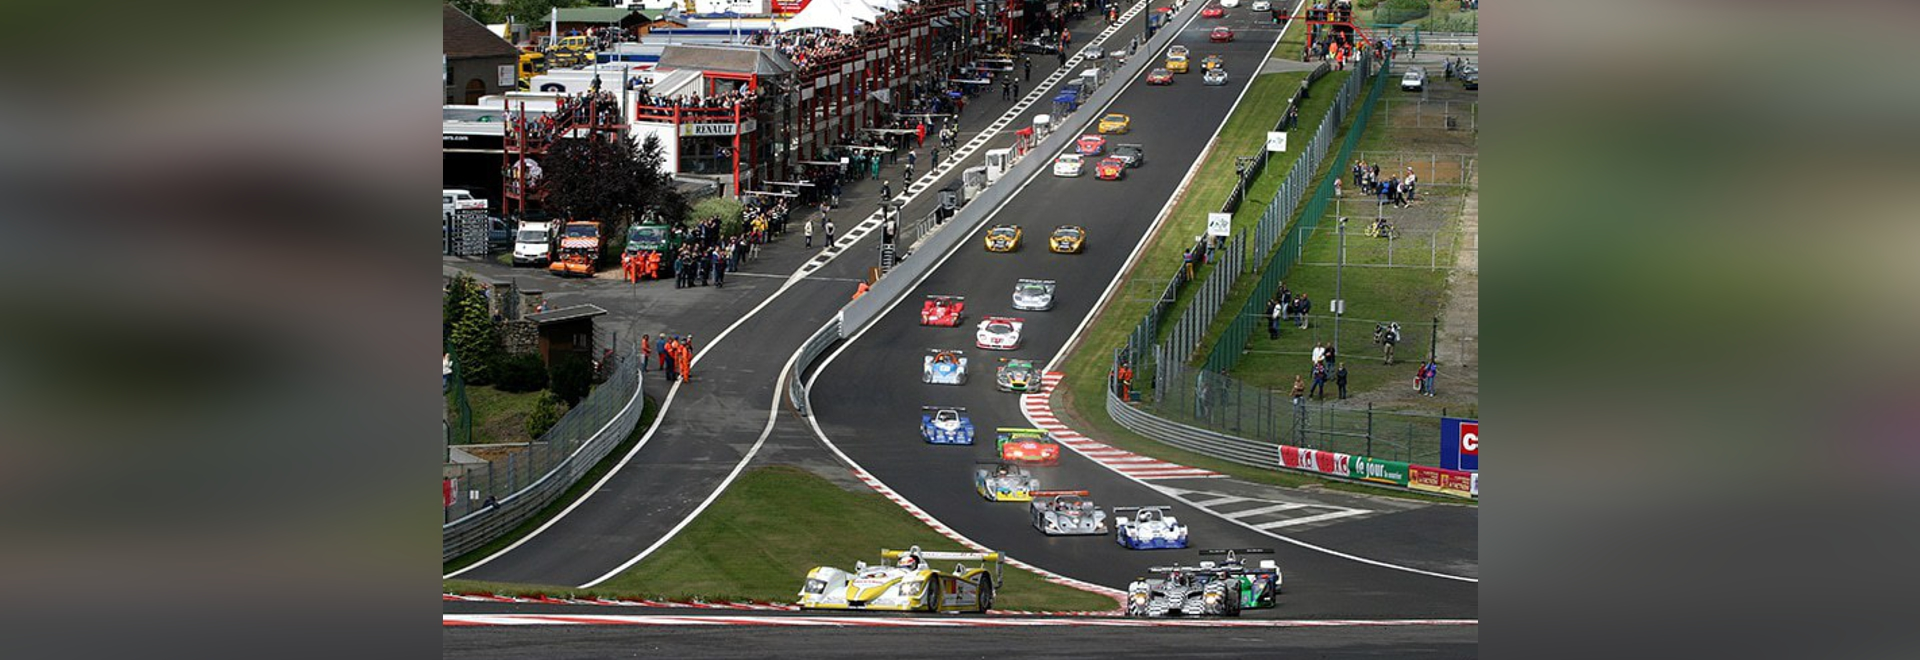 Circuito De Spa Francorchamps : Sdm instala armarios eldon en el circuito de spa francorchamps av